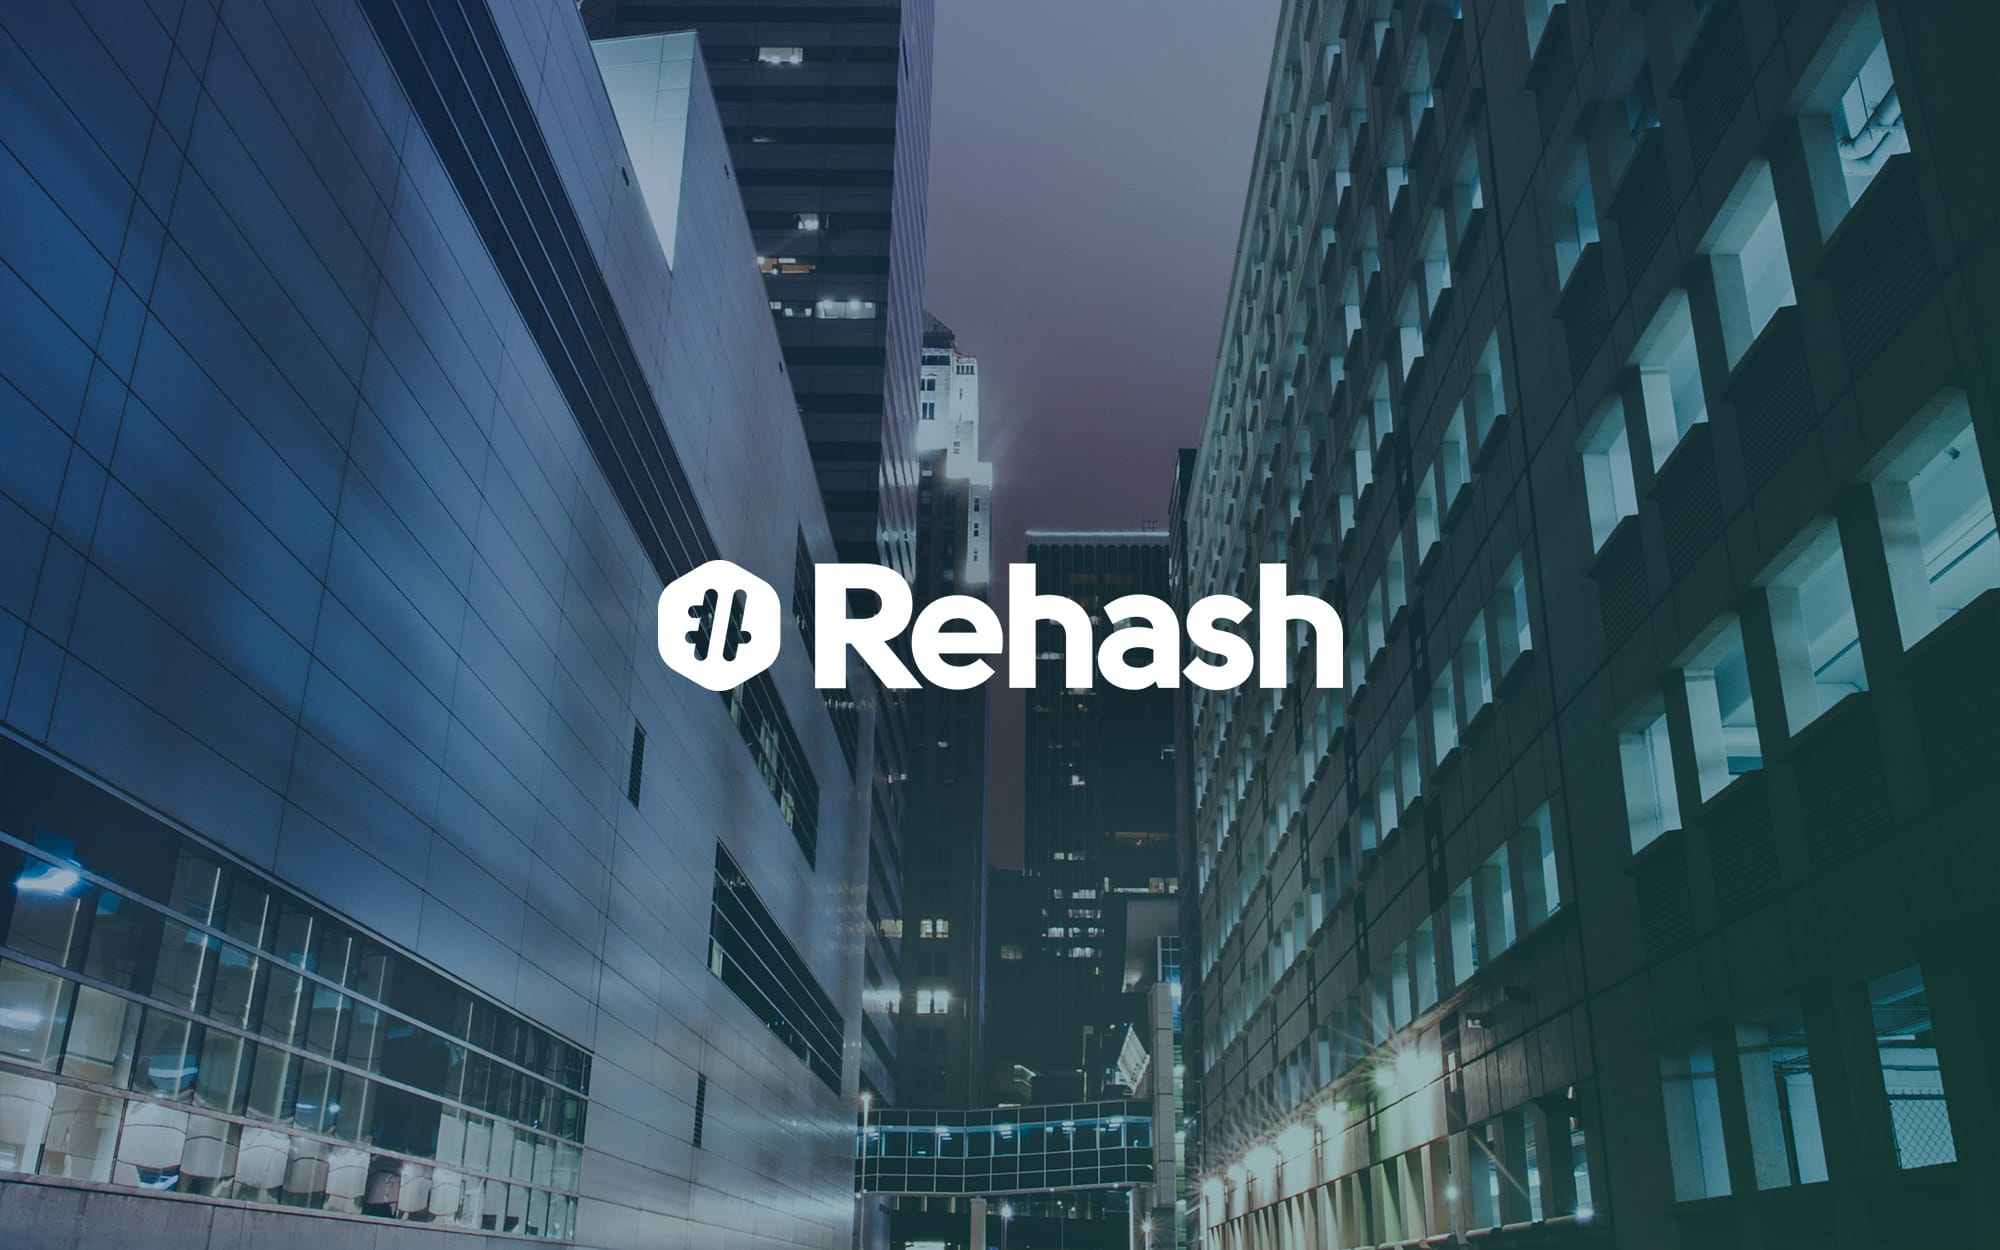 Rehash okc banner